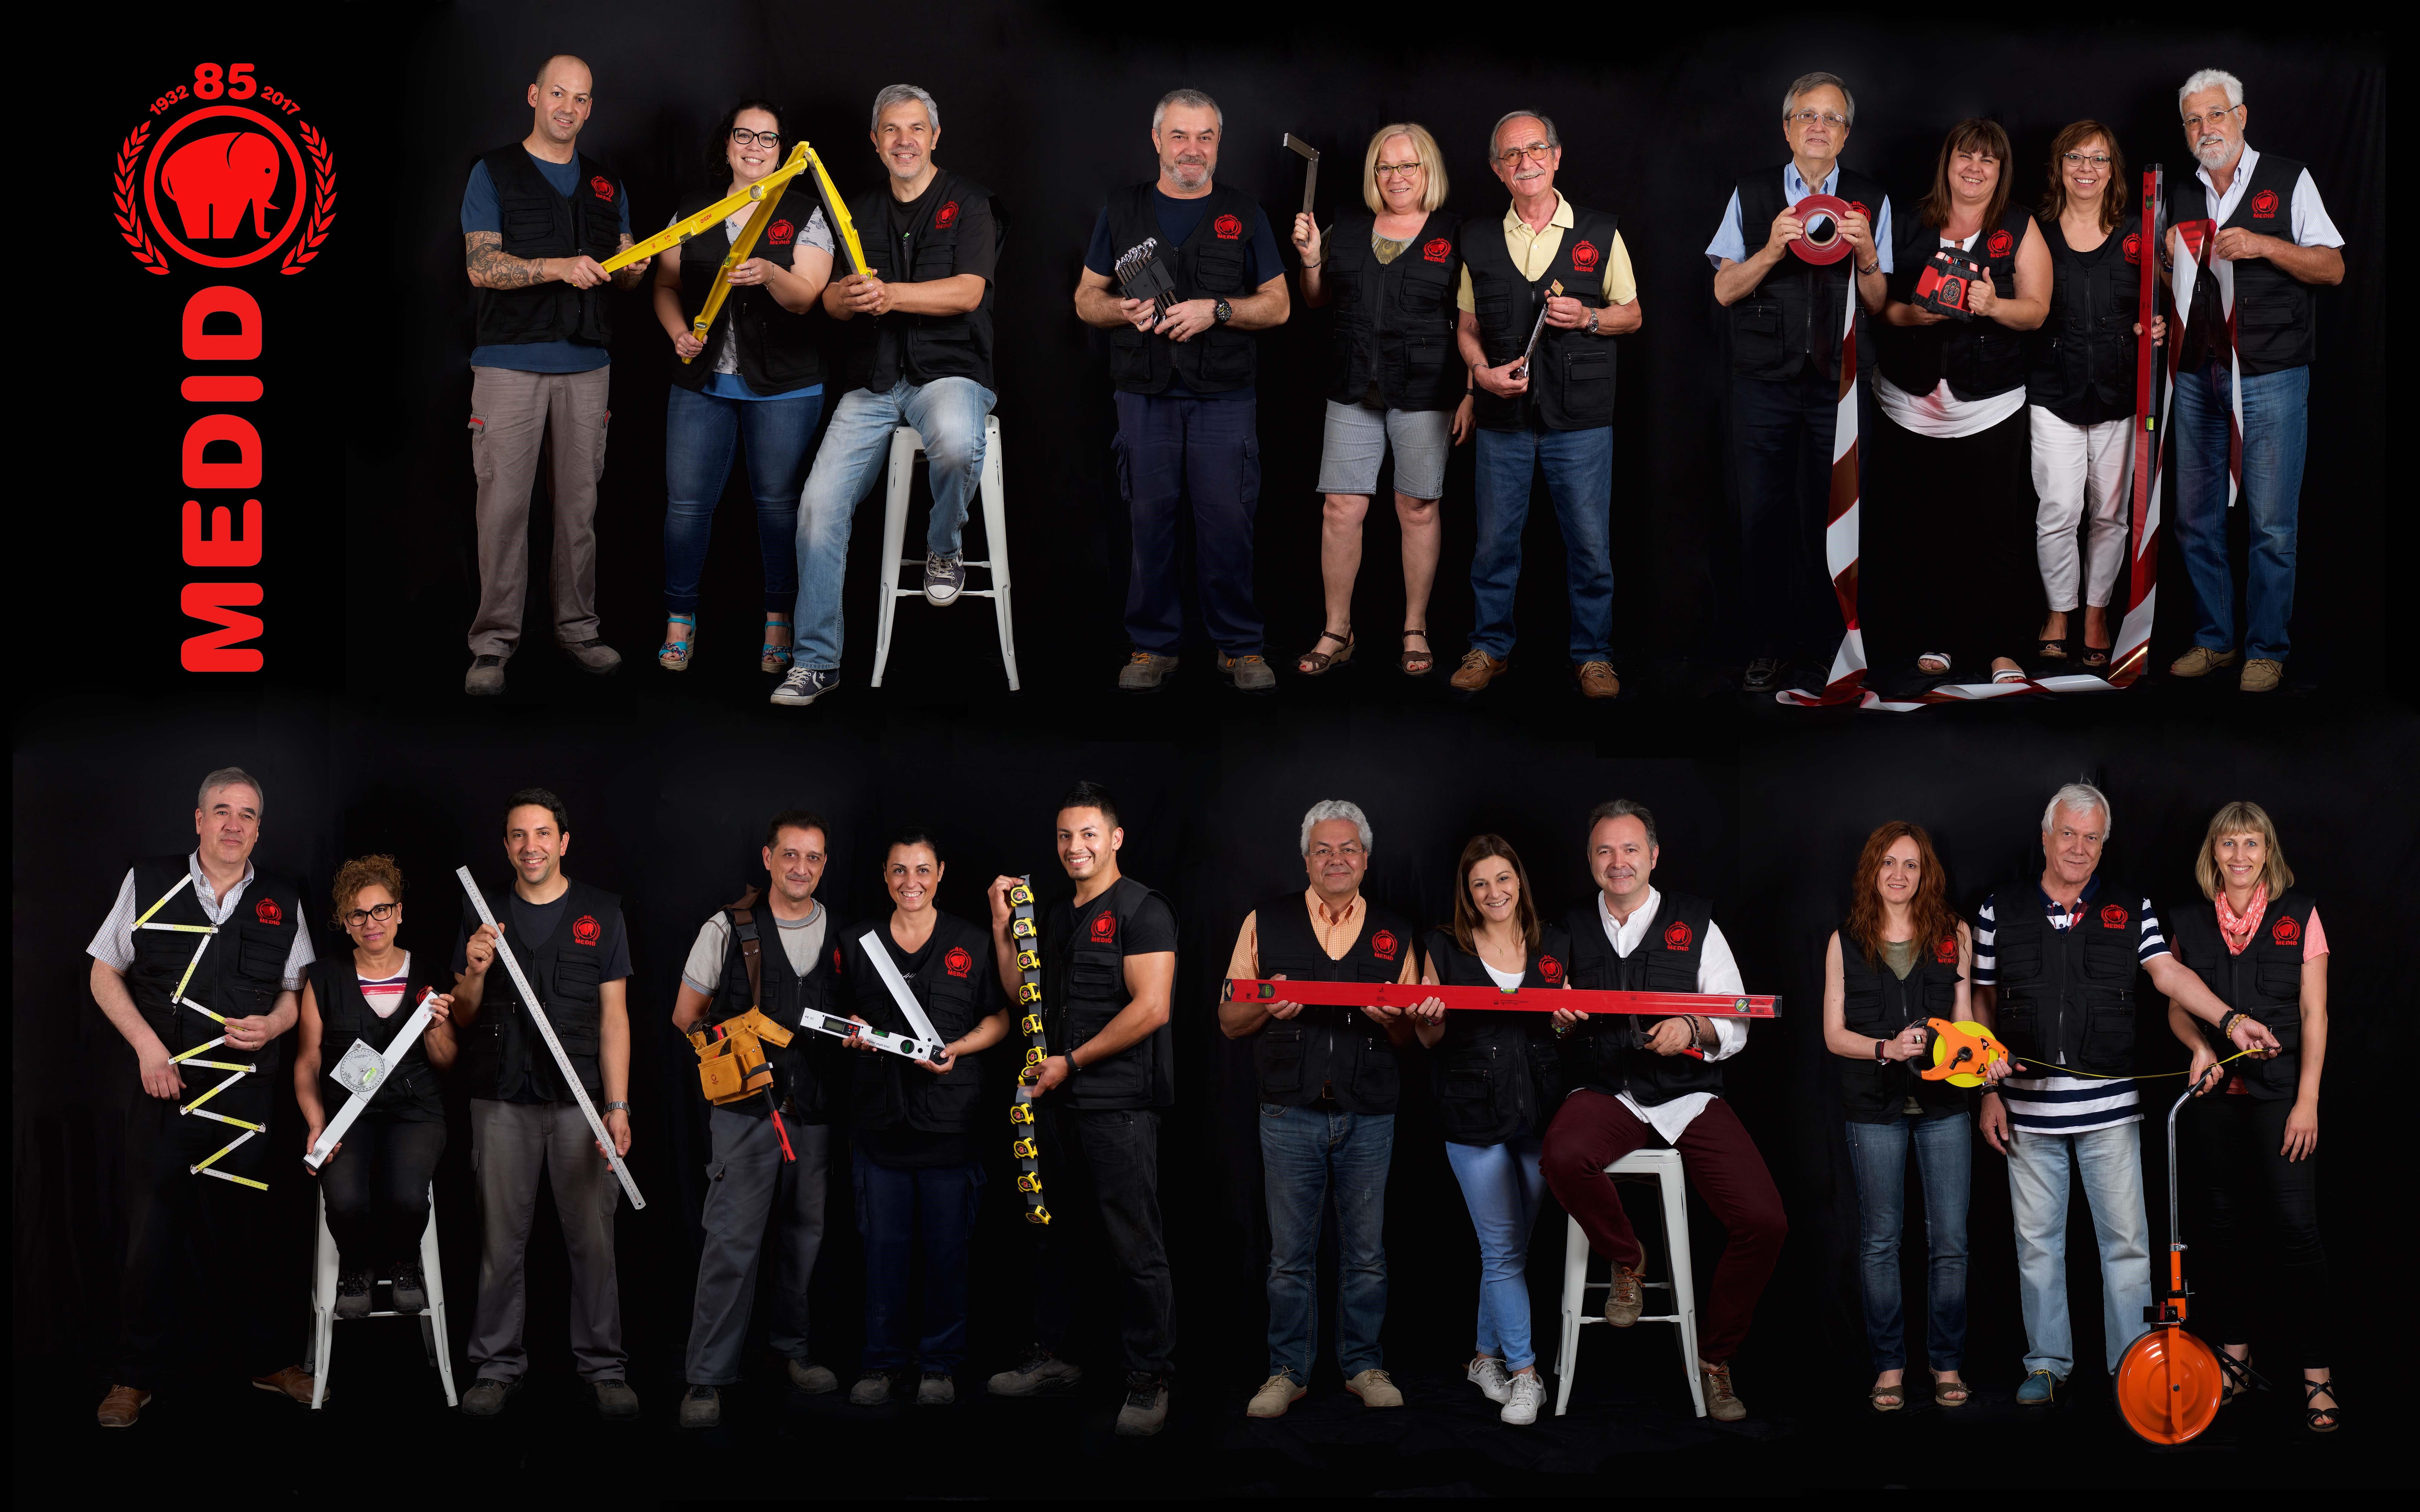 foto MEDID team